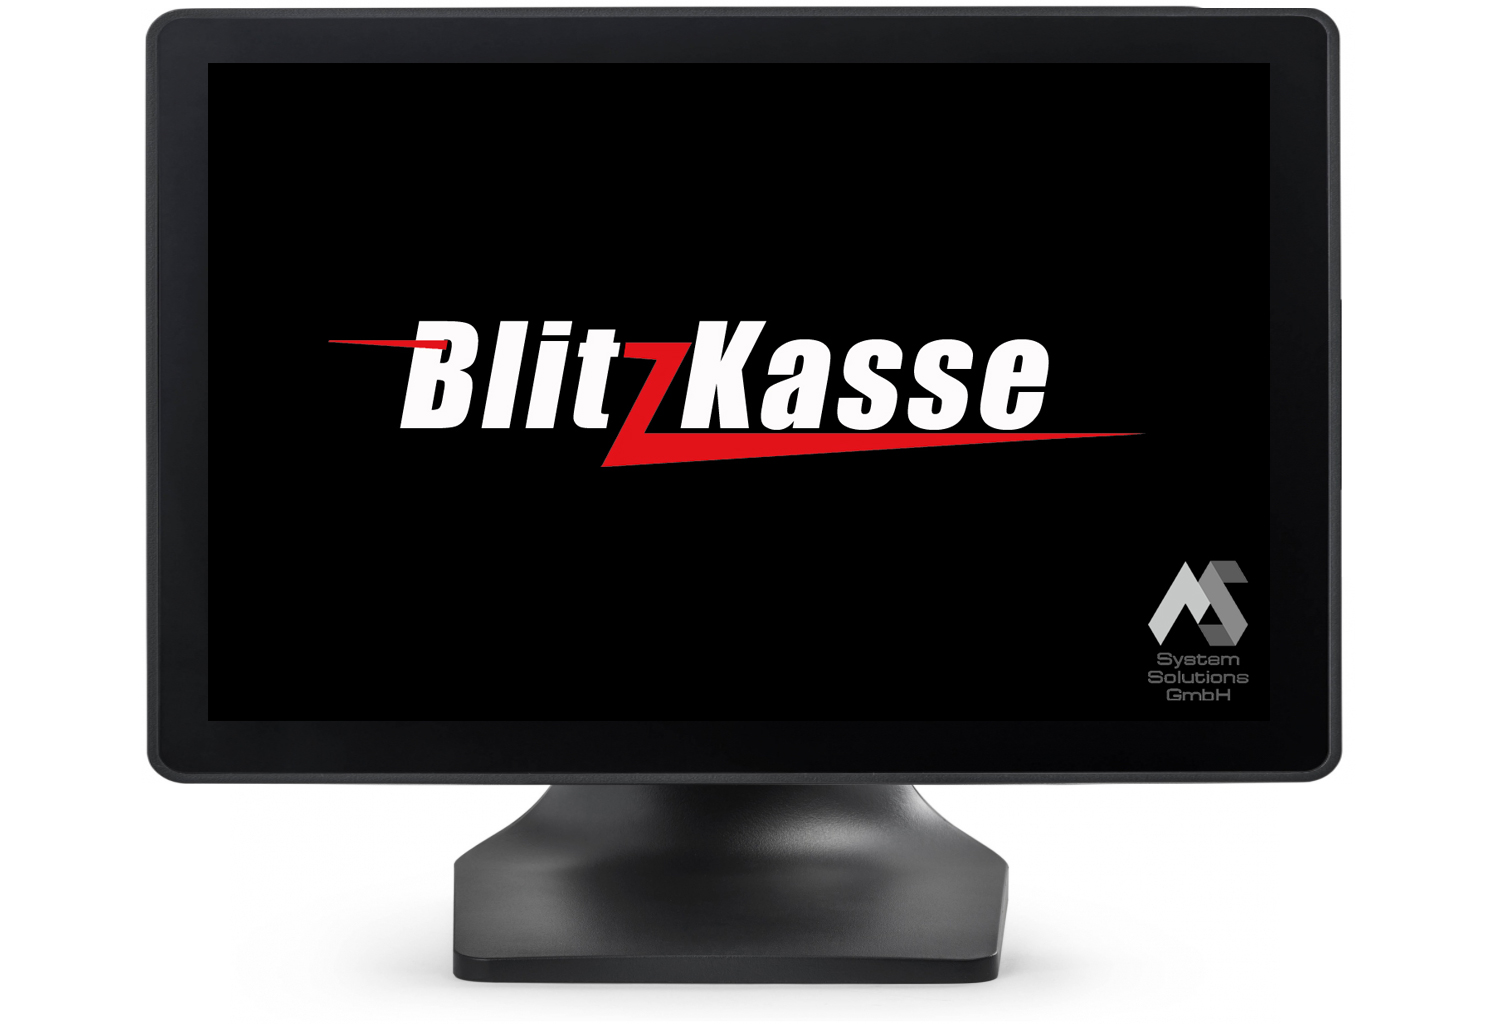 BlitzKasse-15.4Zoll-Touch-insika-konform-insikakkasse-fuer-gastronomie-02 www blitzkasse de